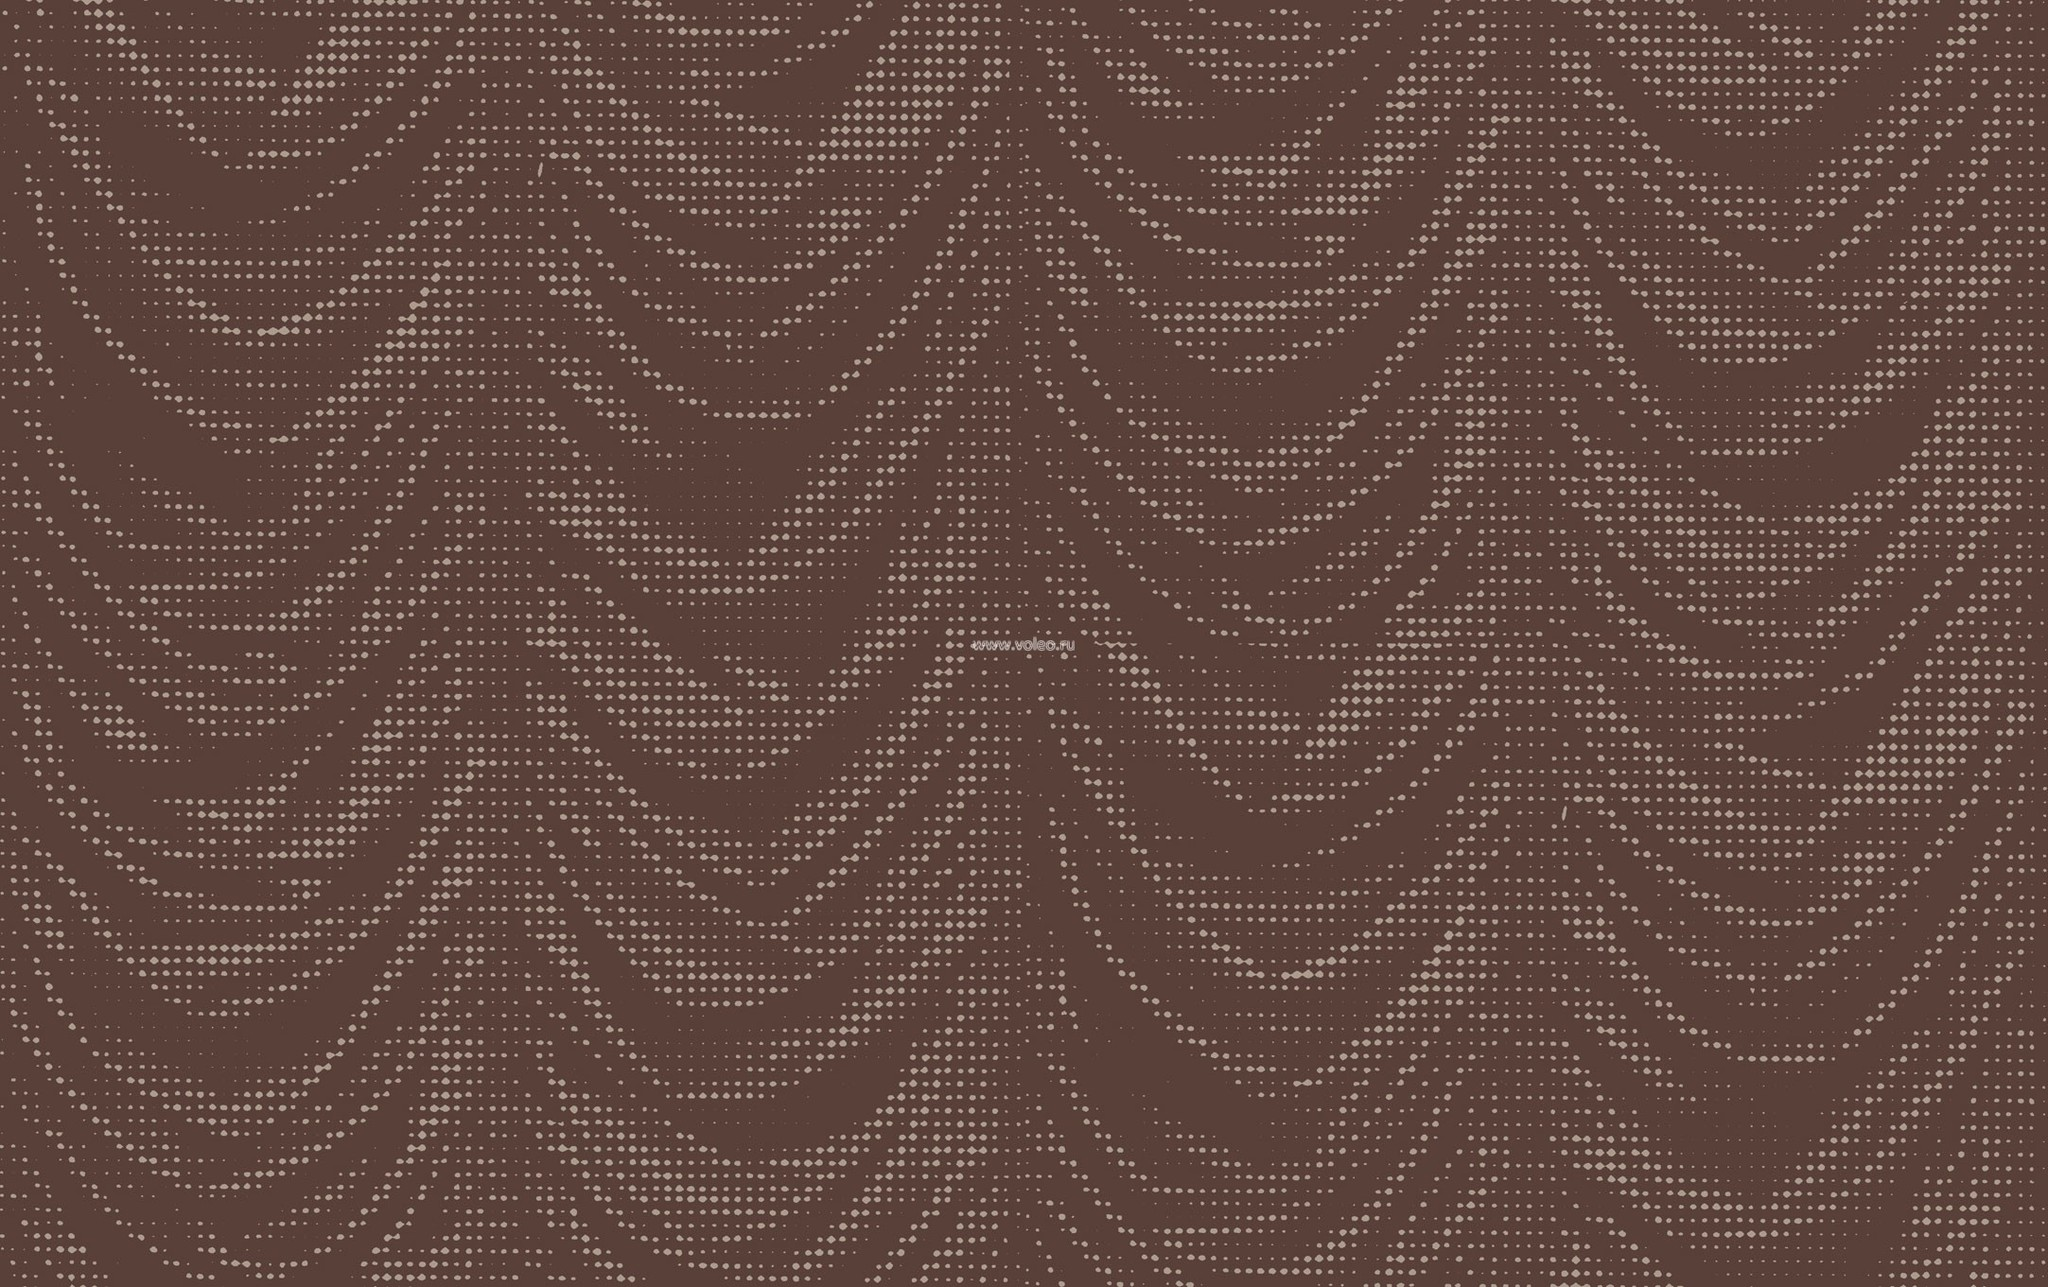 Обои Cole & Son Geometric 93/7025, интернет магазин Волео